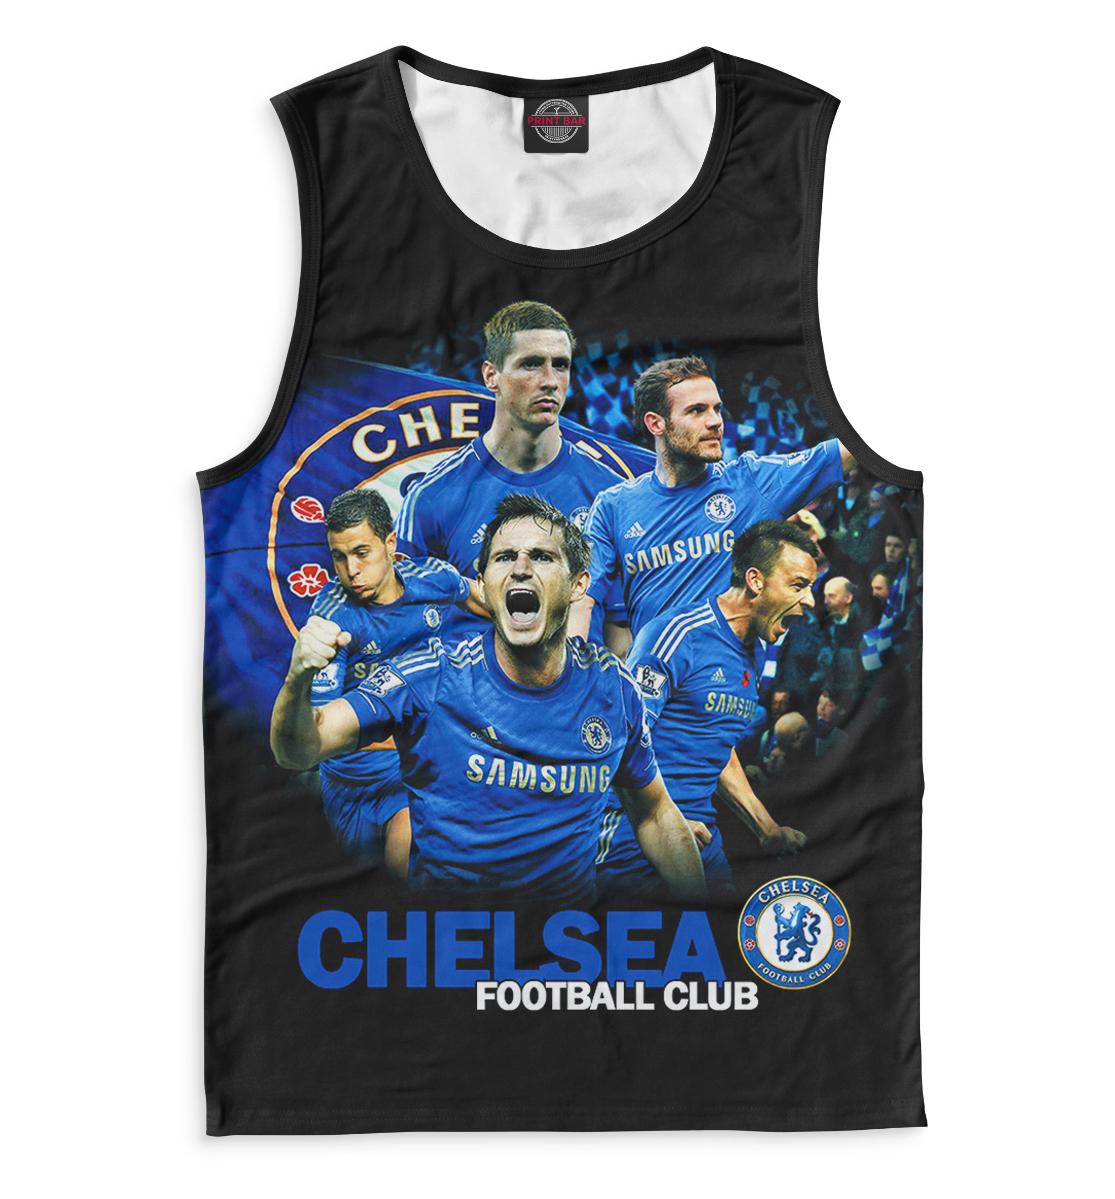 Купить Майка для мальчика Chelsea CHL-889686-may-2